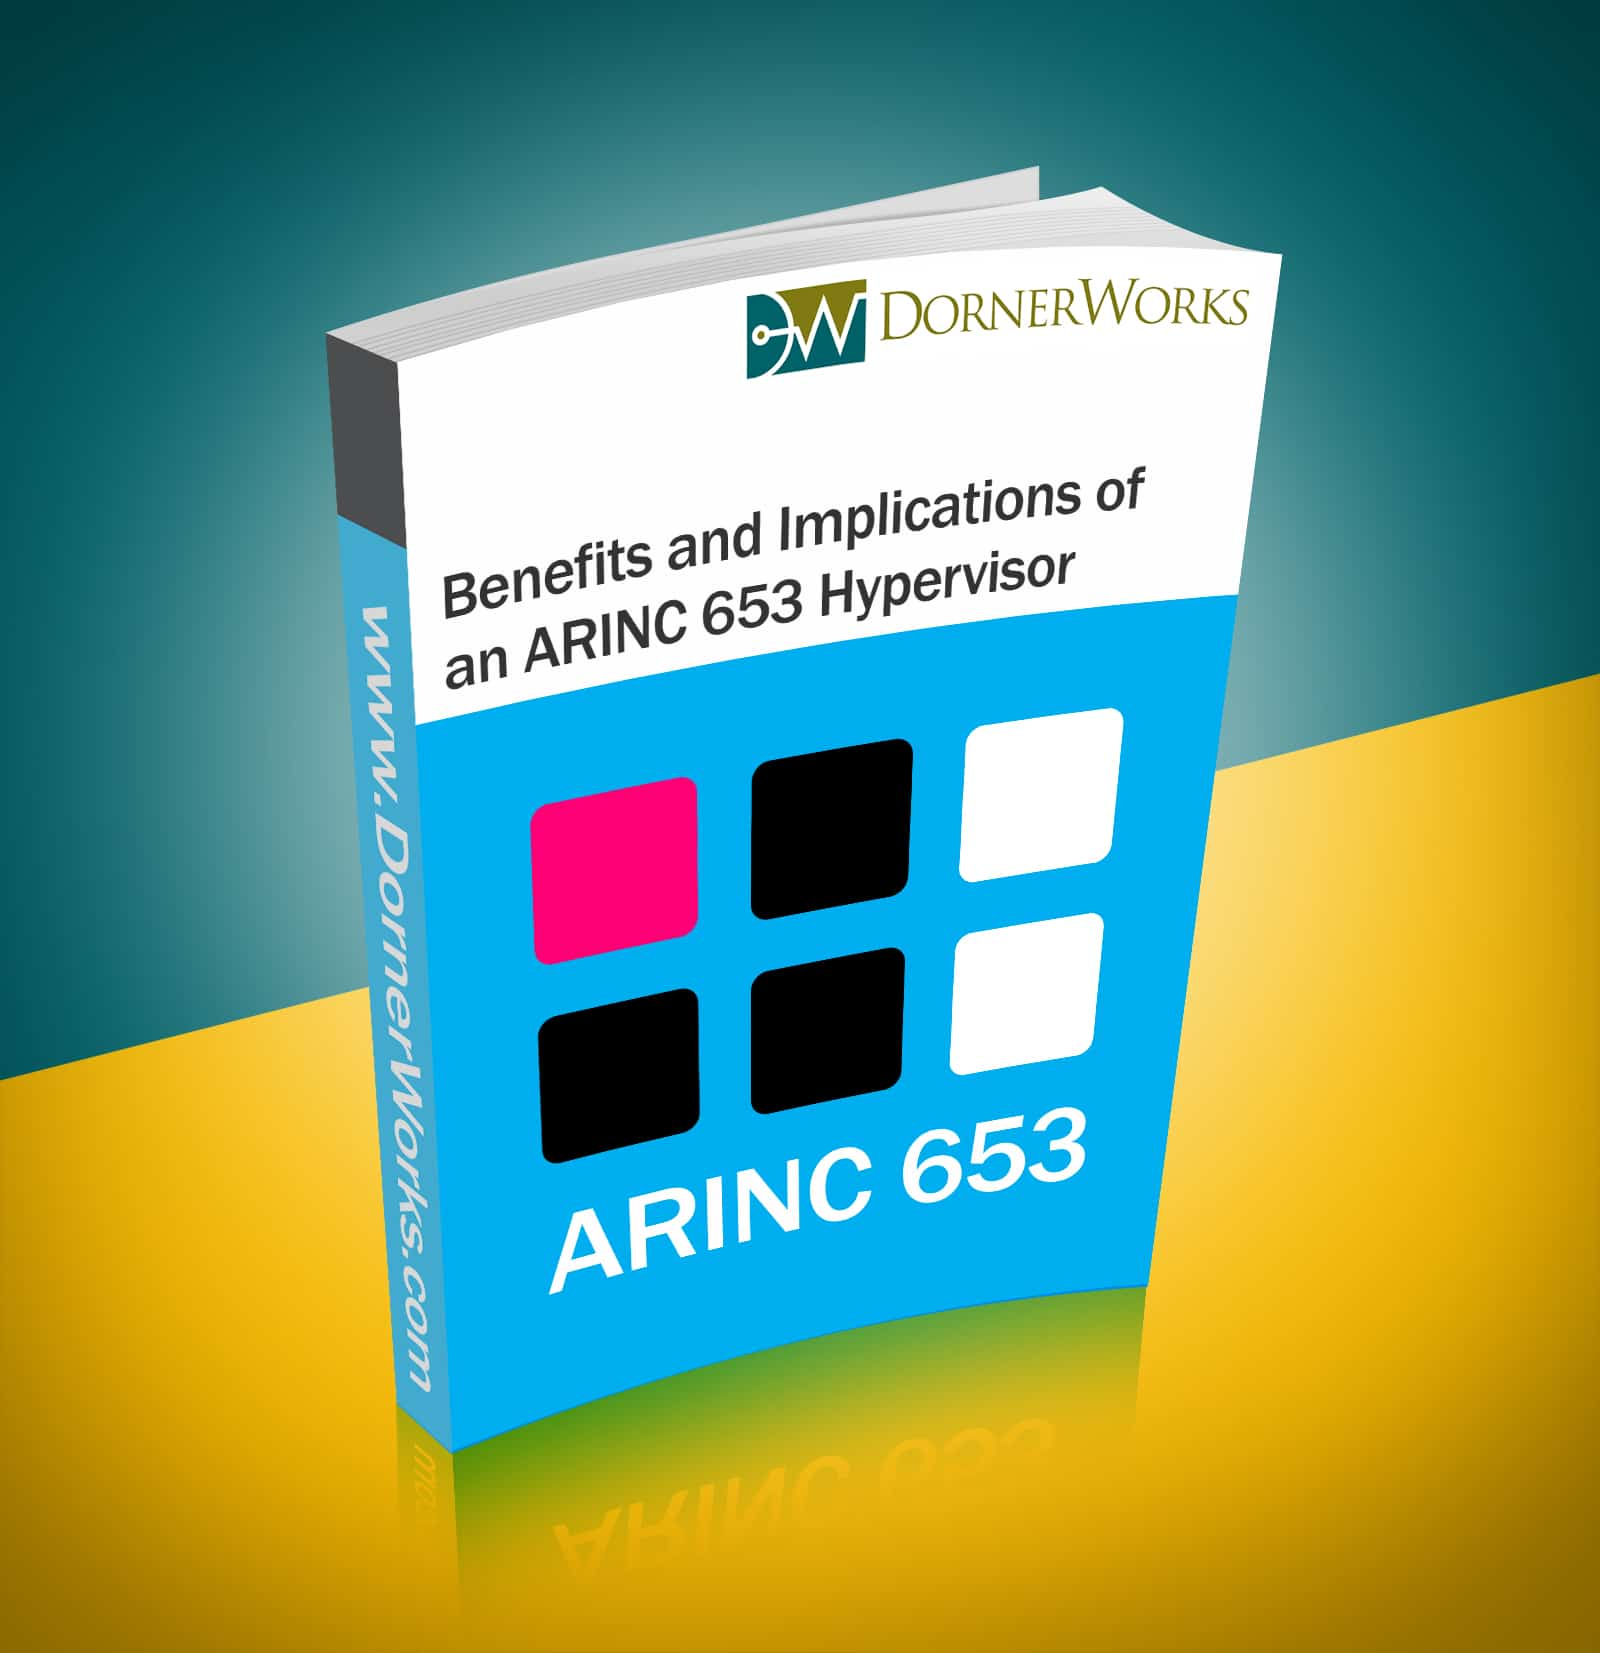 ARINC 653 Hypervisor